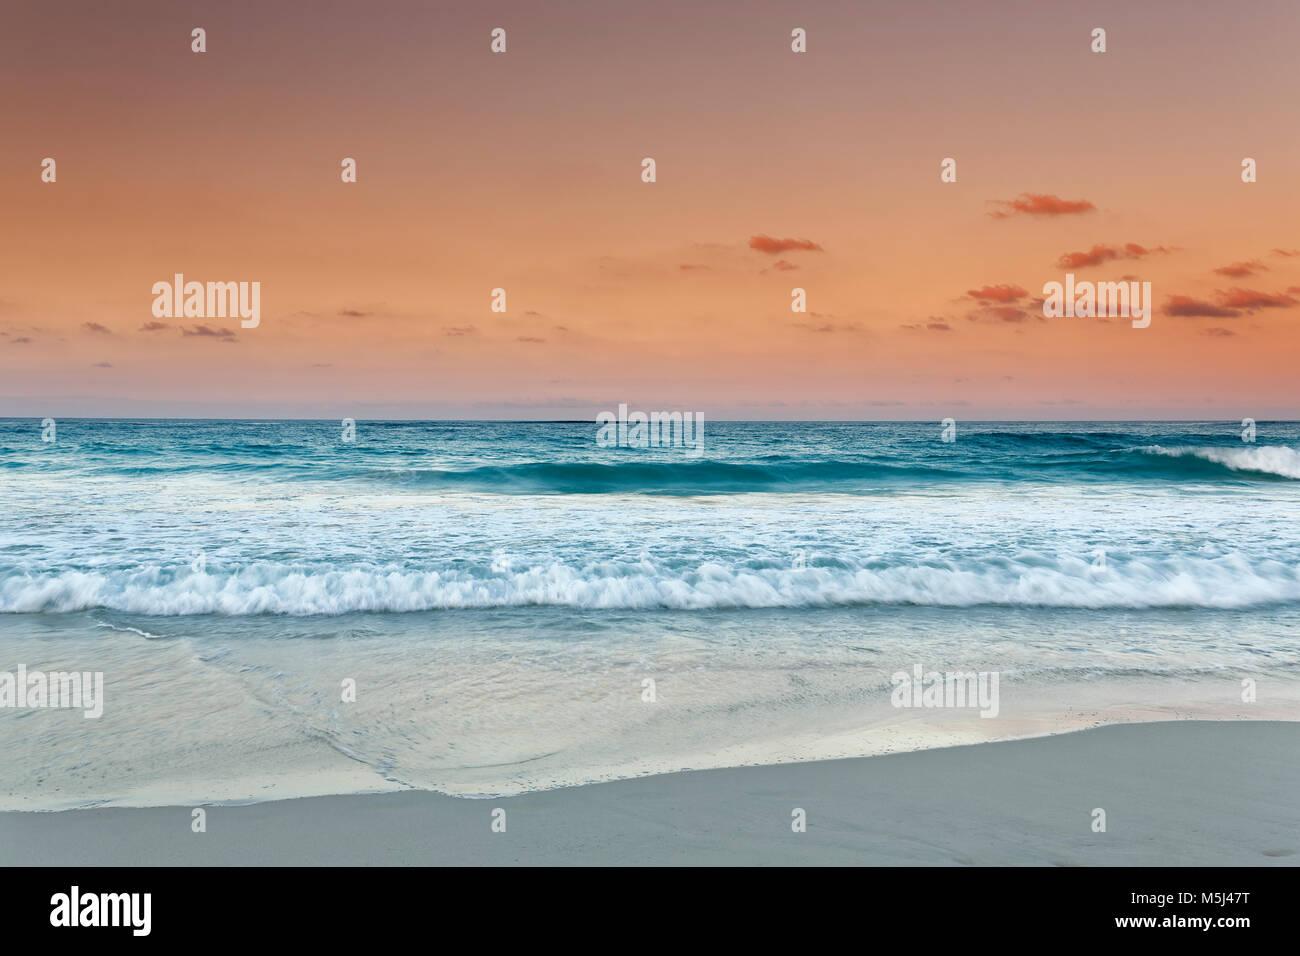 Carribean, Dominican Republic, Punta Cana, Playa Bavaro, view to the sea at sunset - Stock Image